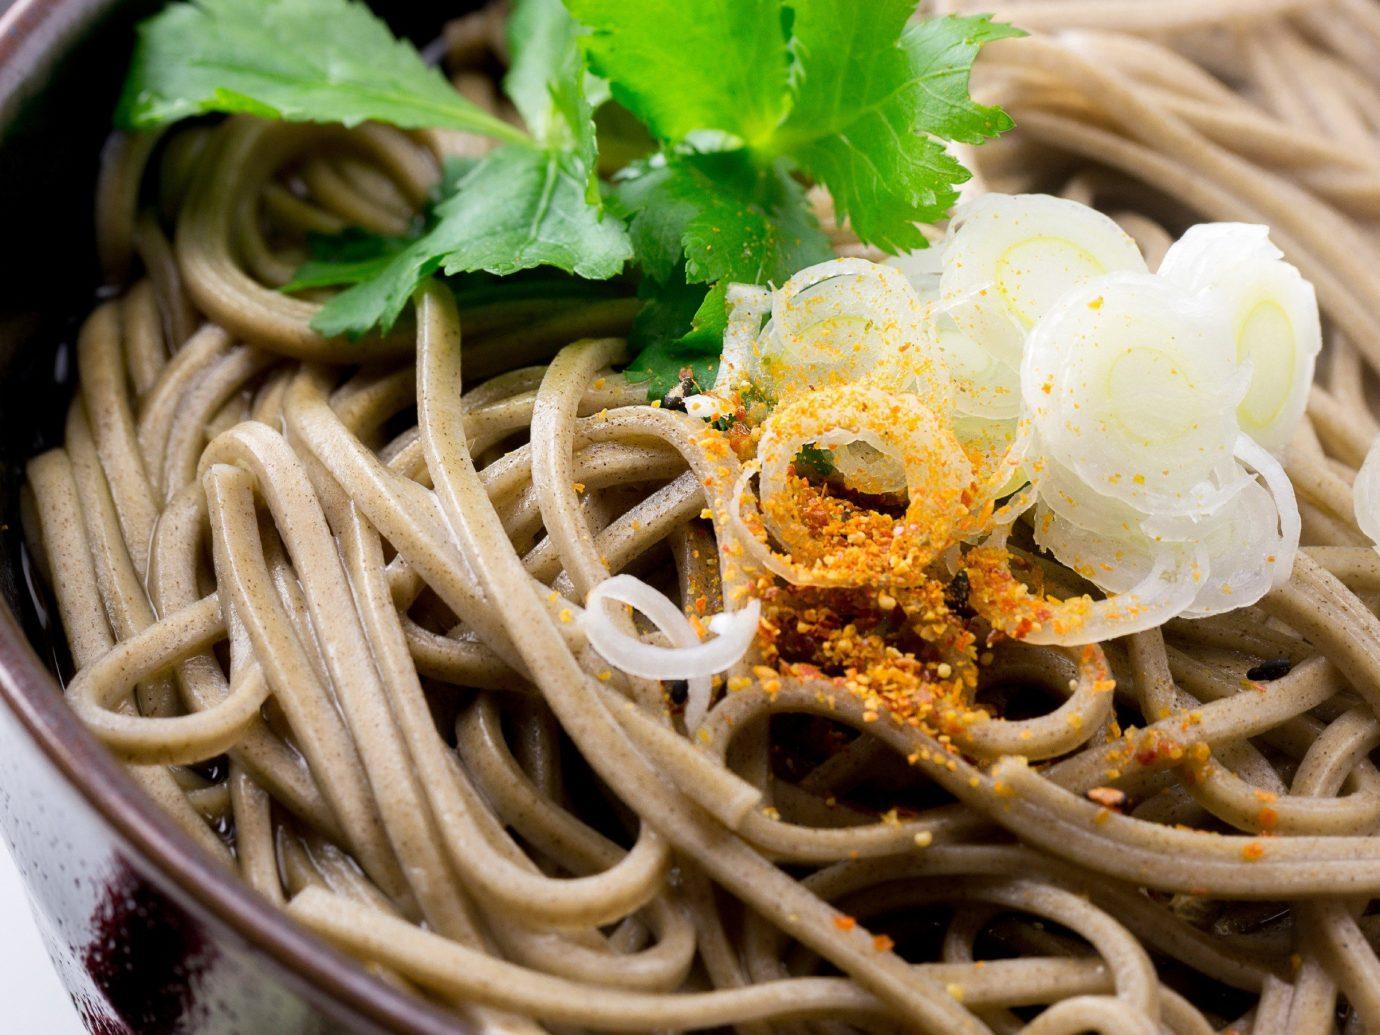 Food + Drink food dish soba cuisine noodle spaghetti asian food chinese noodles chow mein chinese food yakisoba udon japanese cuisine yaki udon pasta fried noodles bucatini produce vegetarian food carbonara spaghetti aglio e olio sauce close